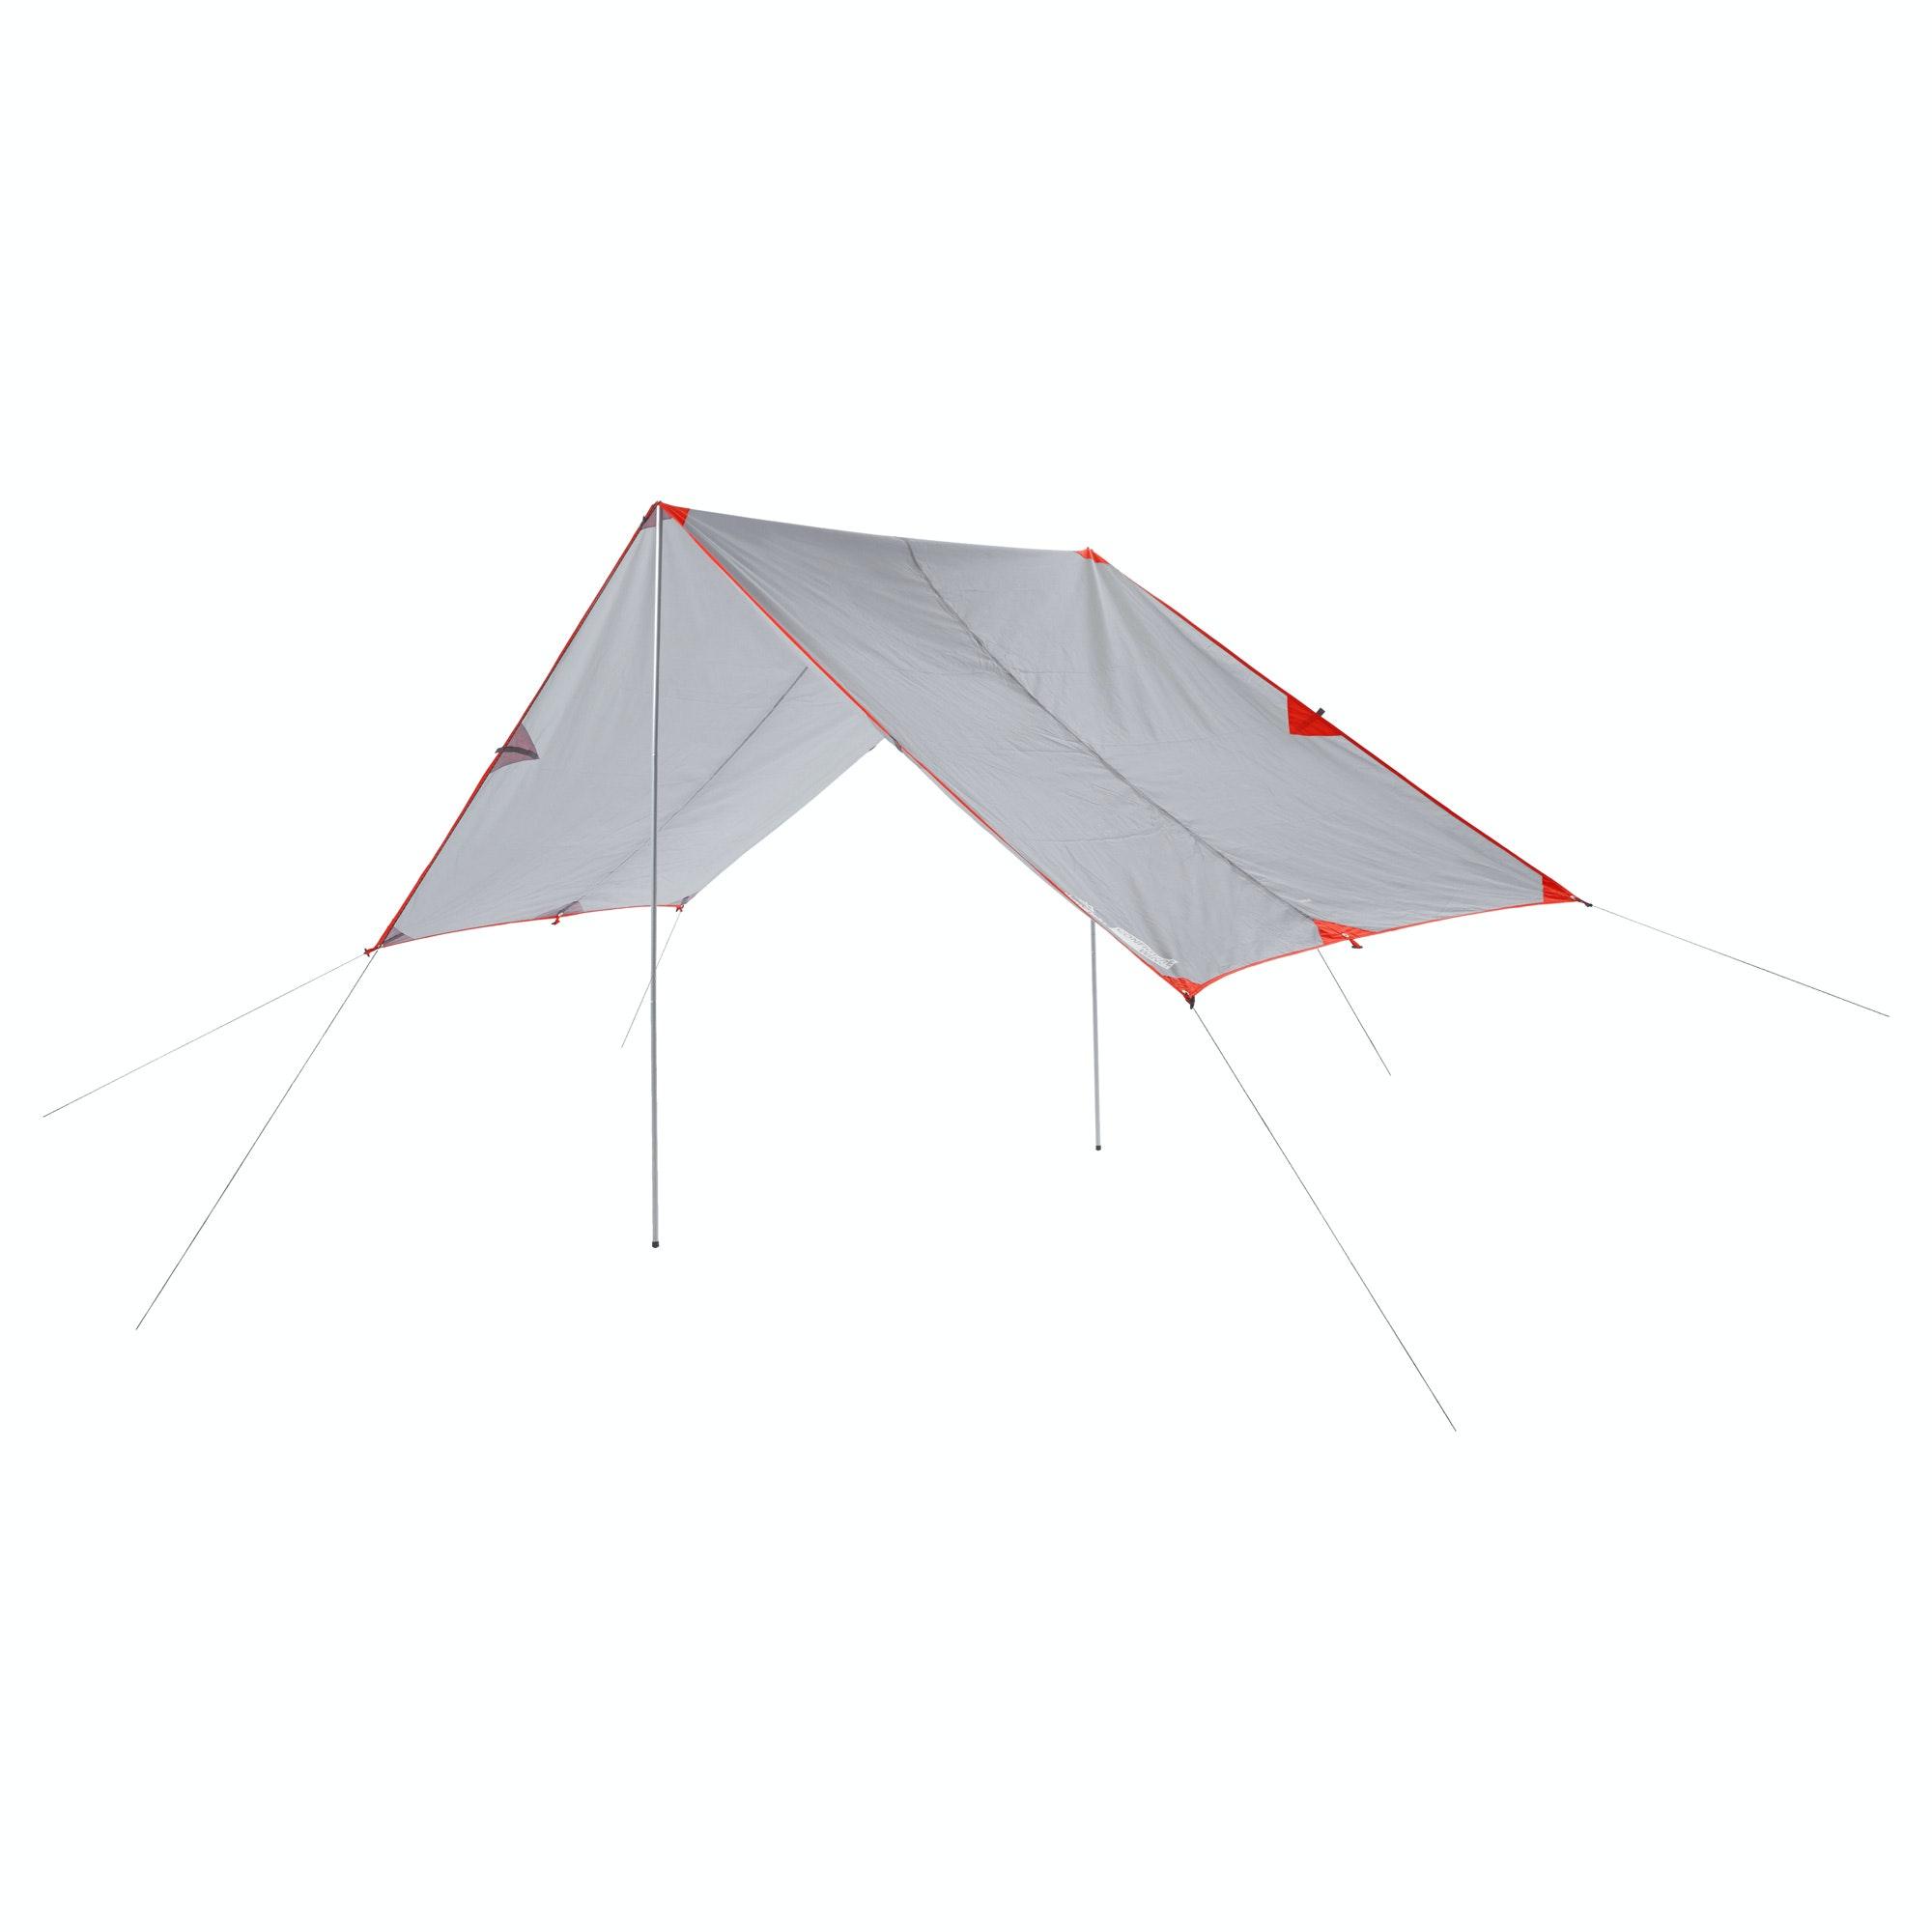 Tents Outdoor Recreation Camping Australia